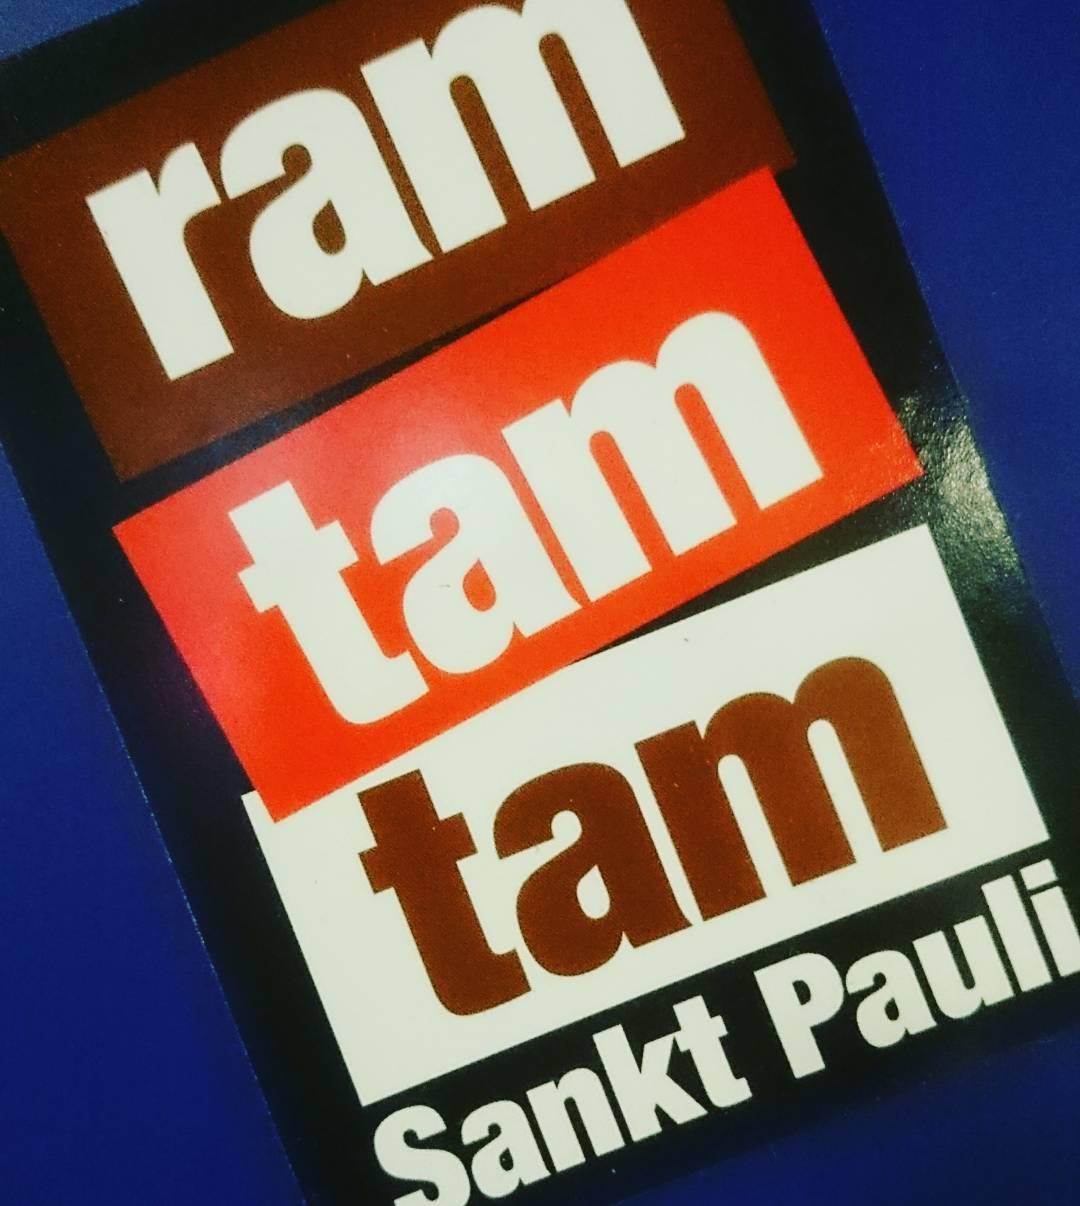 Ramtamtam St. Pauli